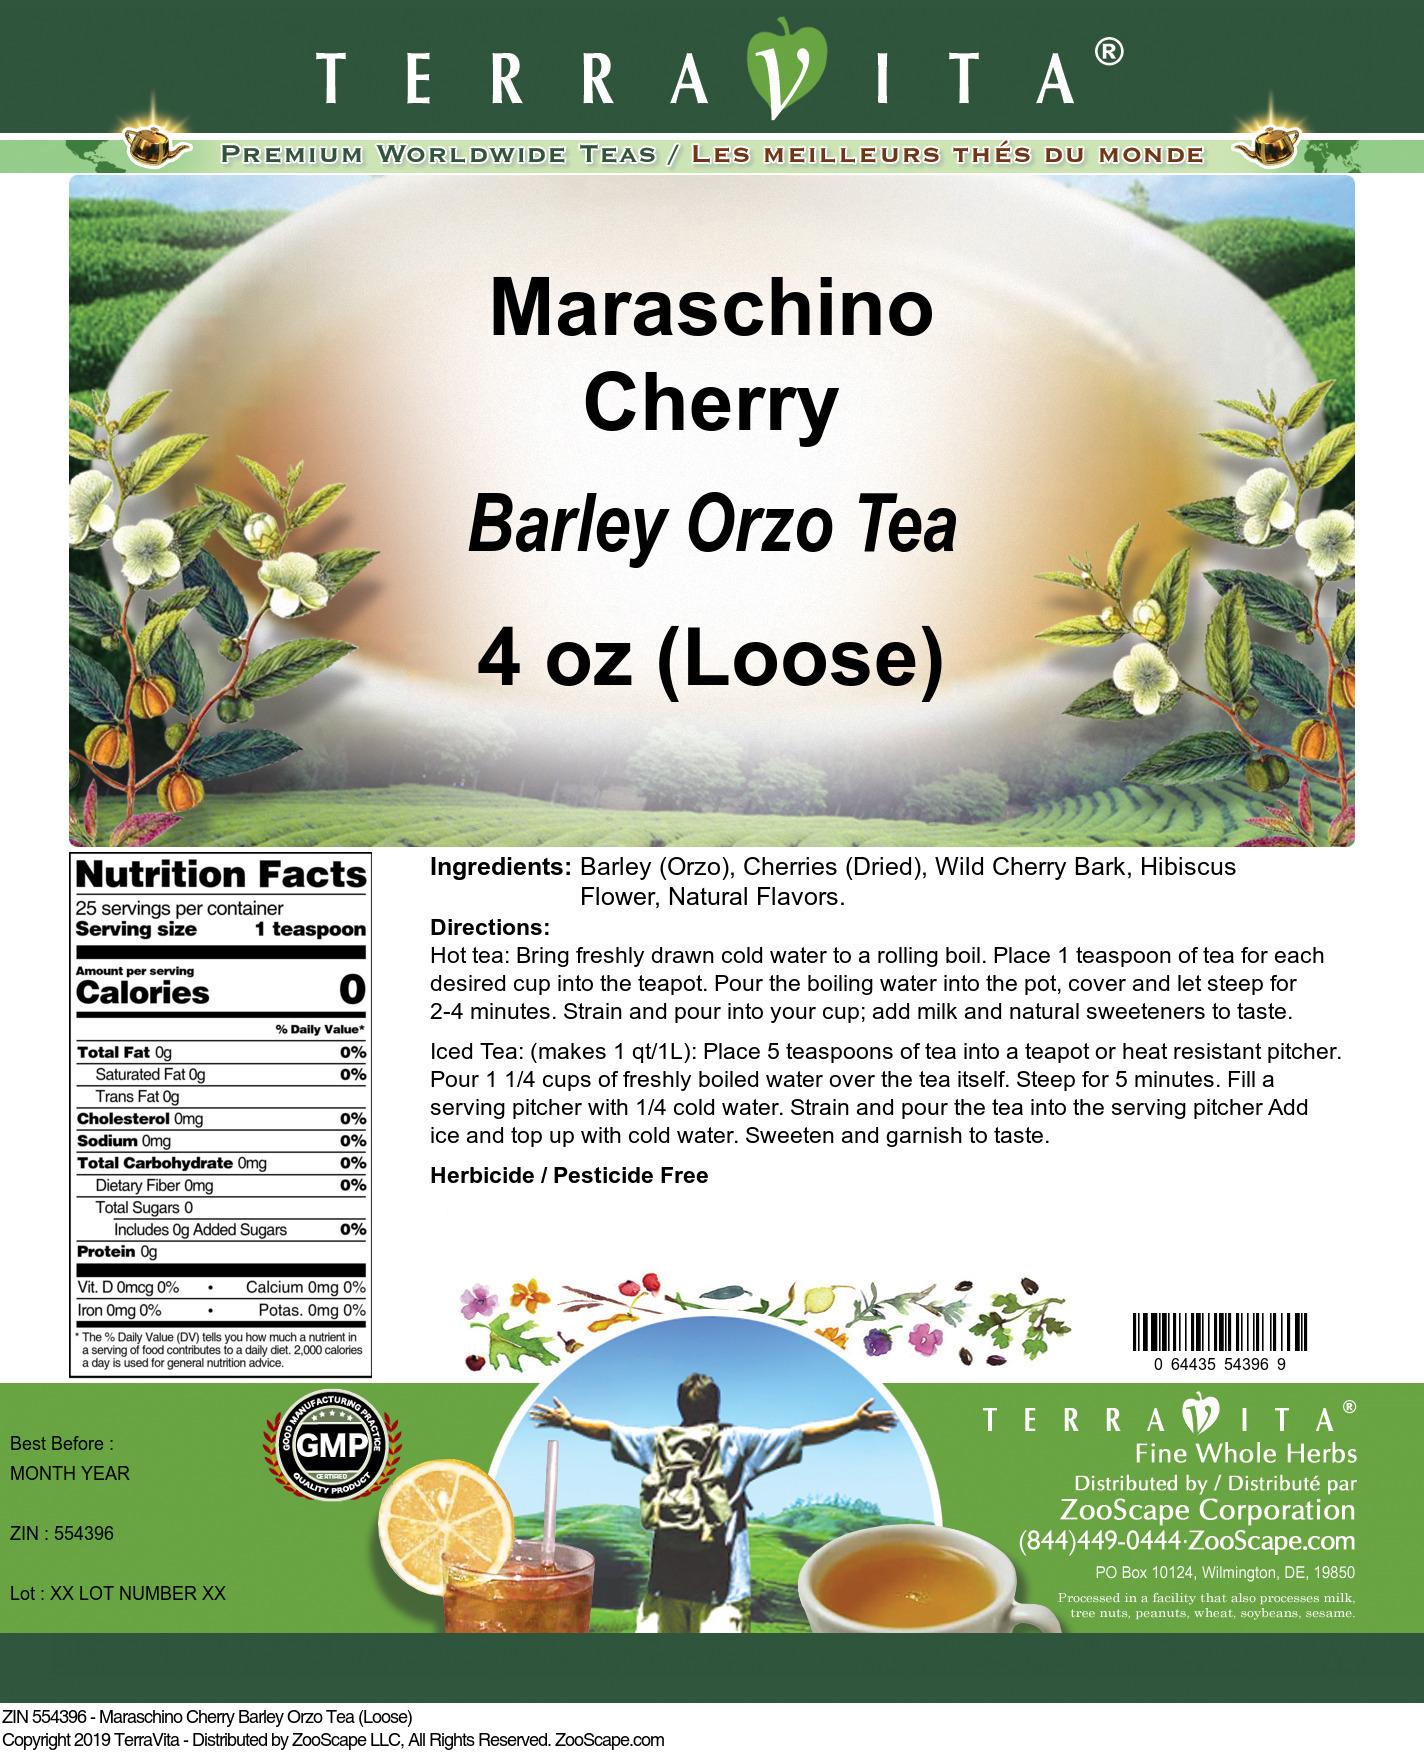 Maraschino Cherry Barley Orzo Tea (Loose)